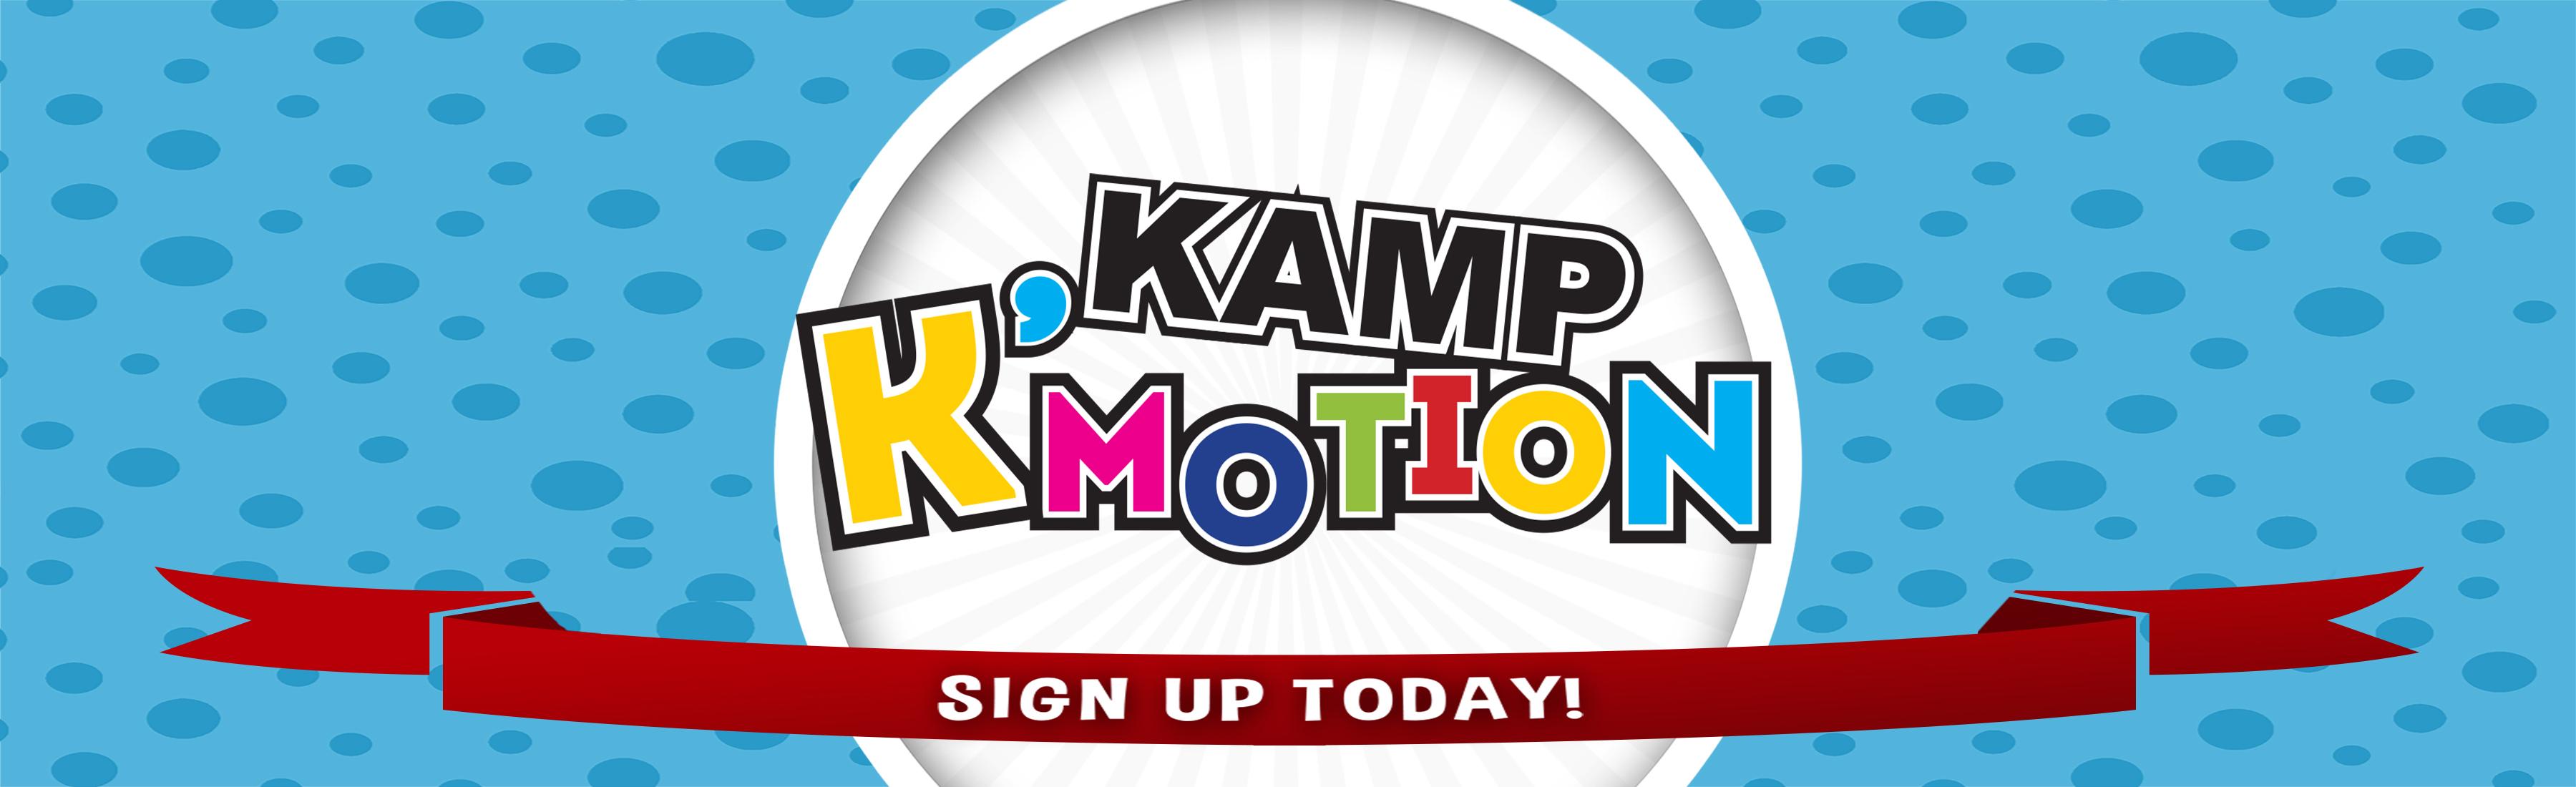 Kamp KMotion 3600x1100